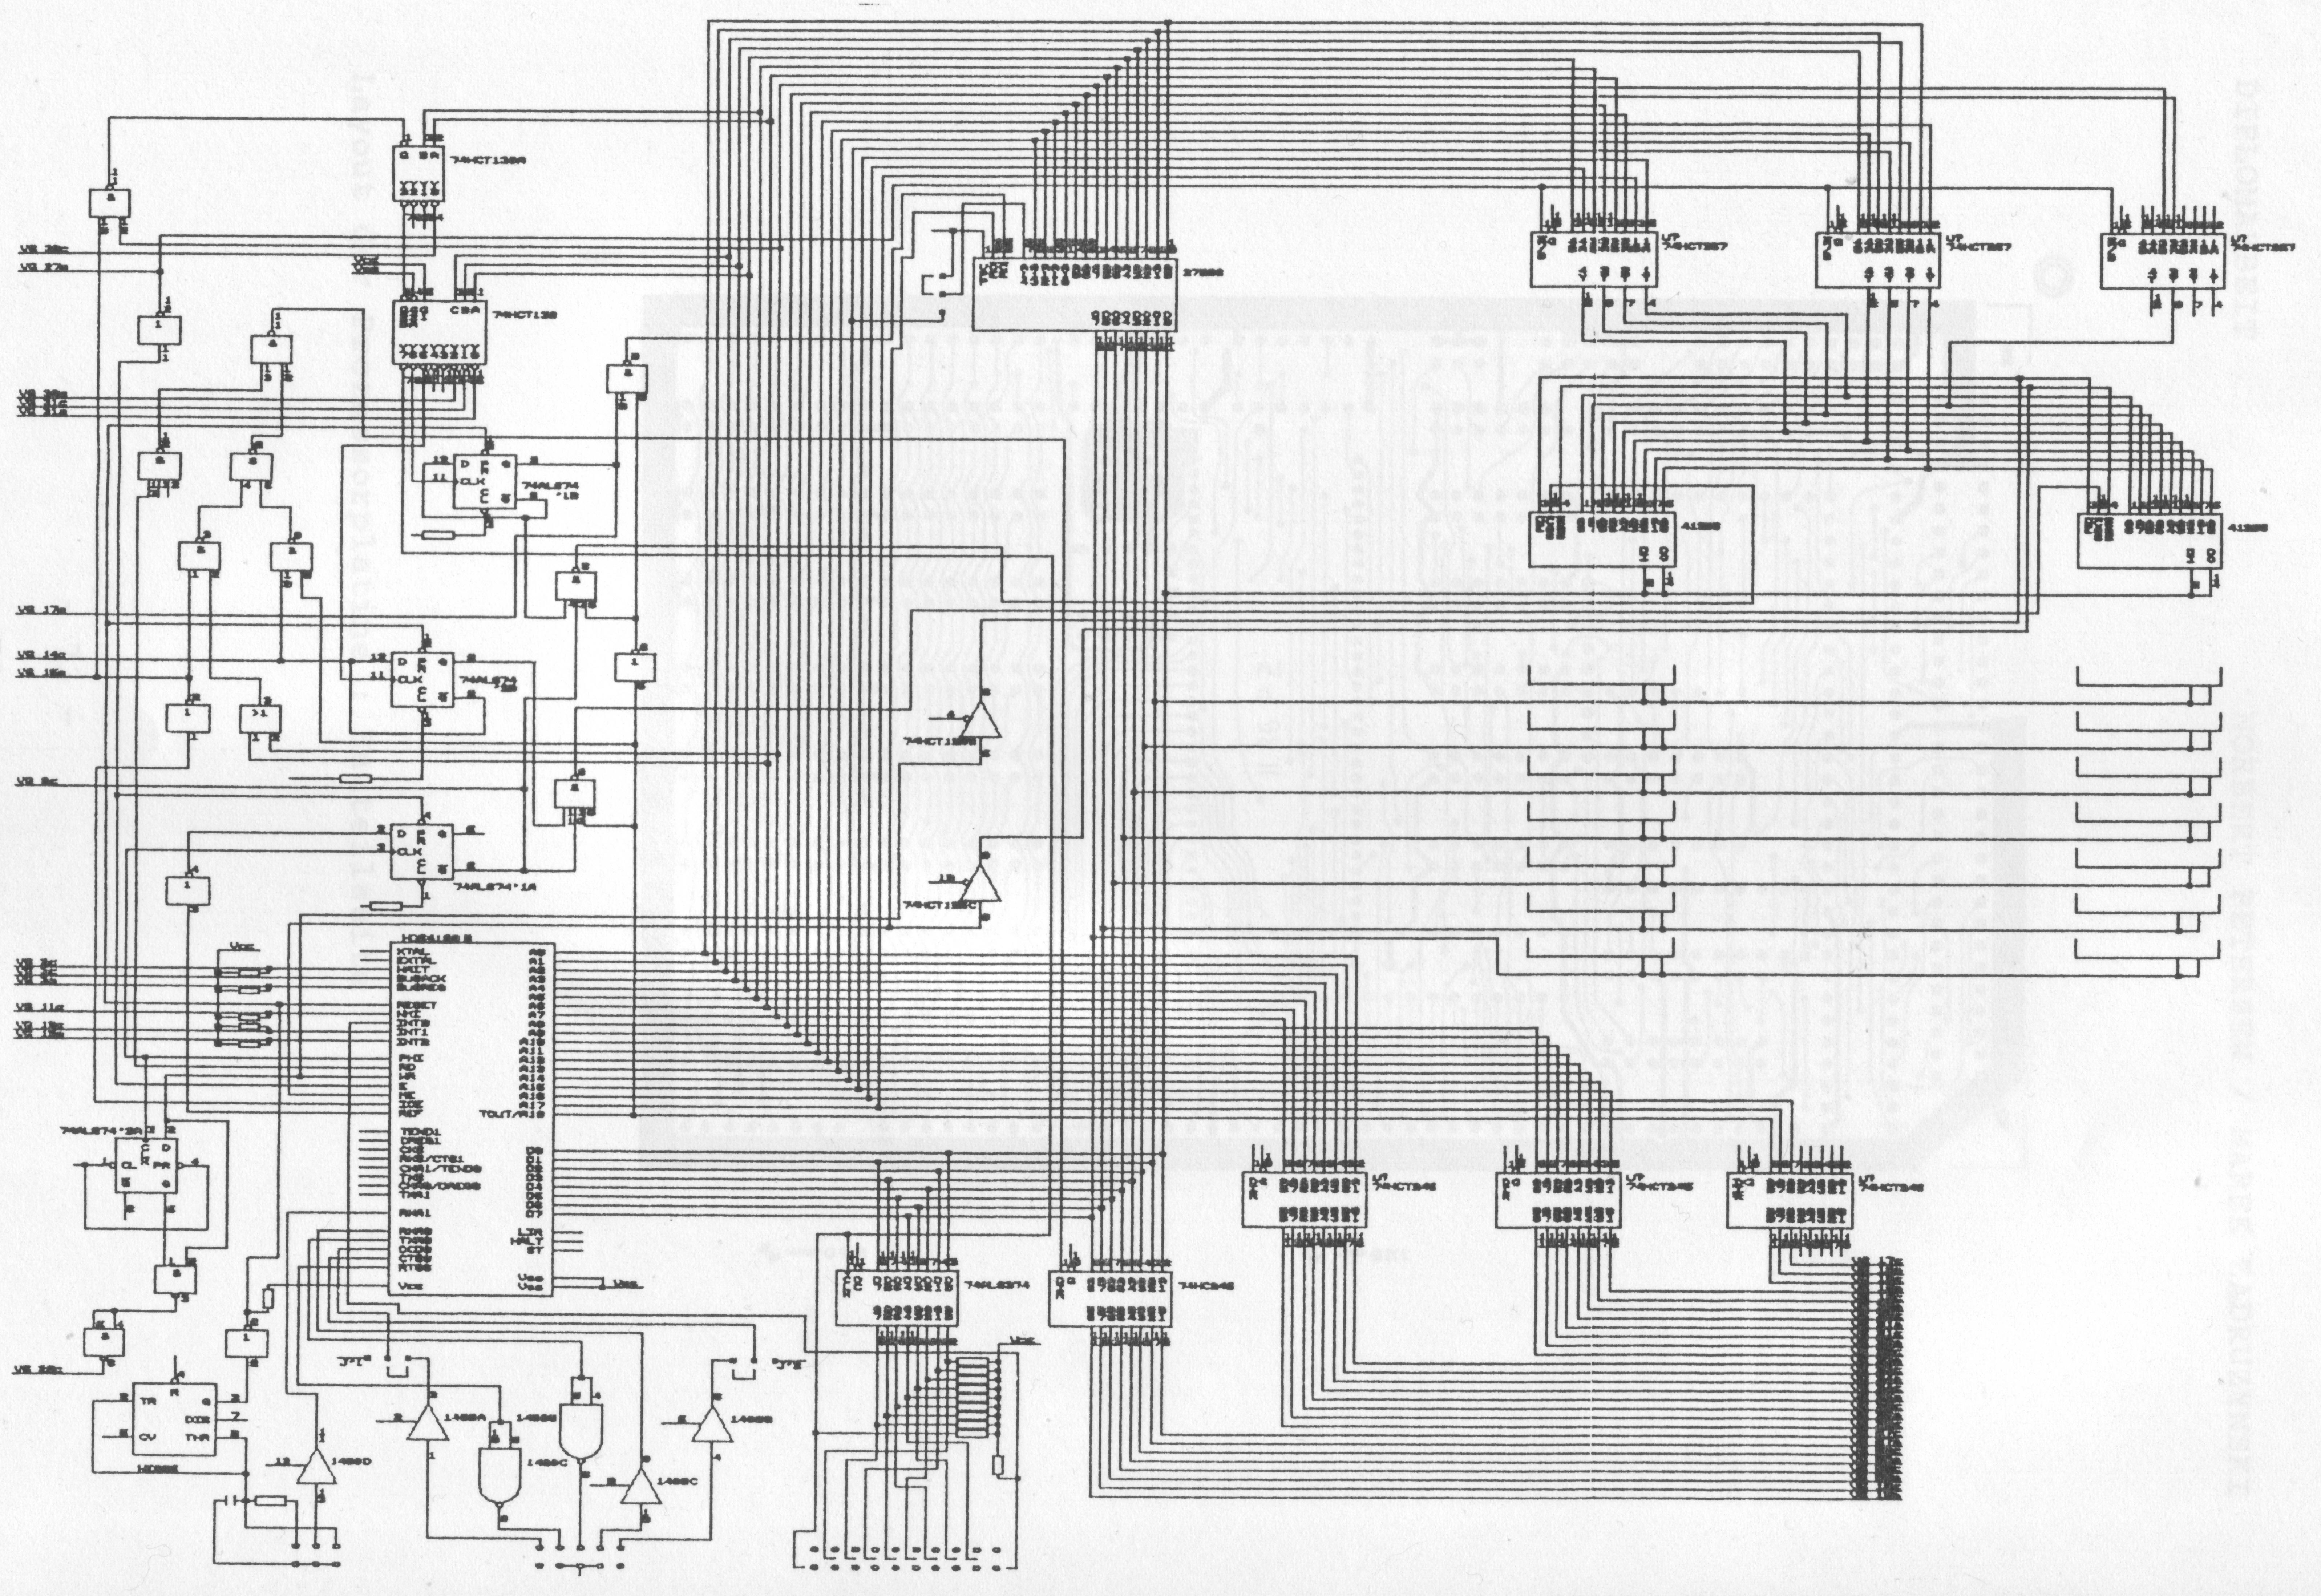 File:SBC HD64180 Schaltplan.jpg - Wikimedia Commons